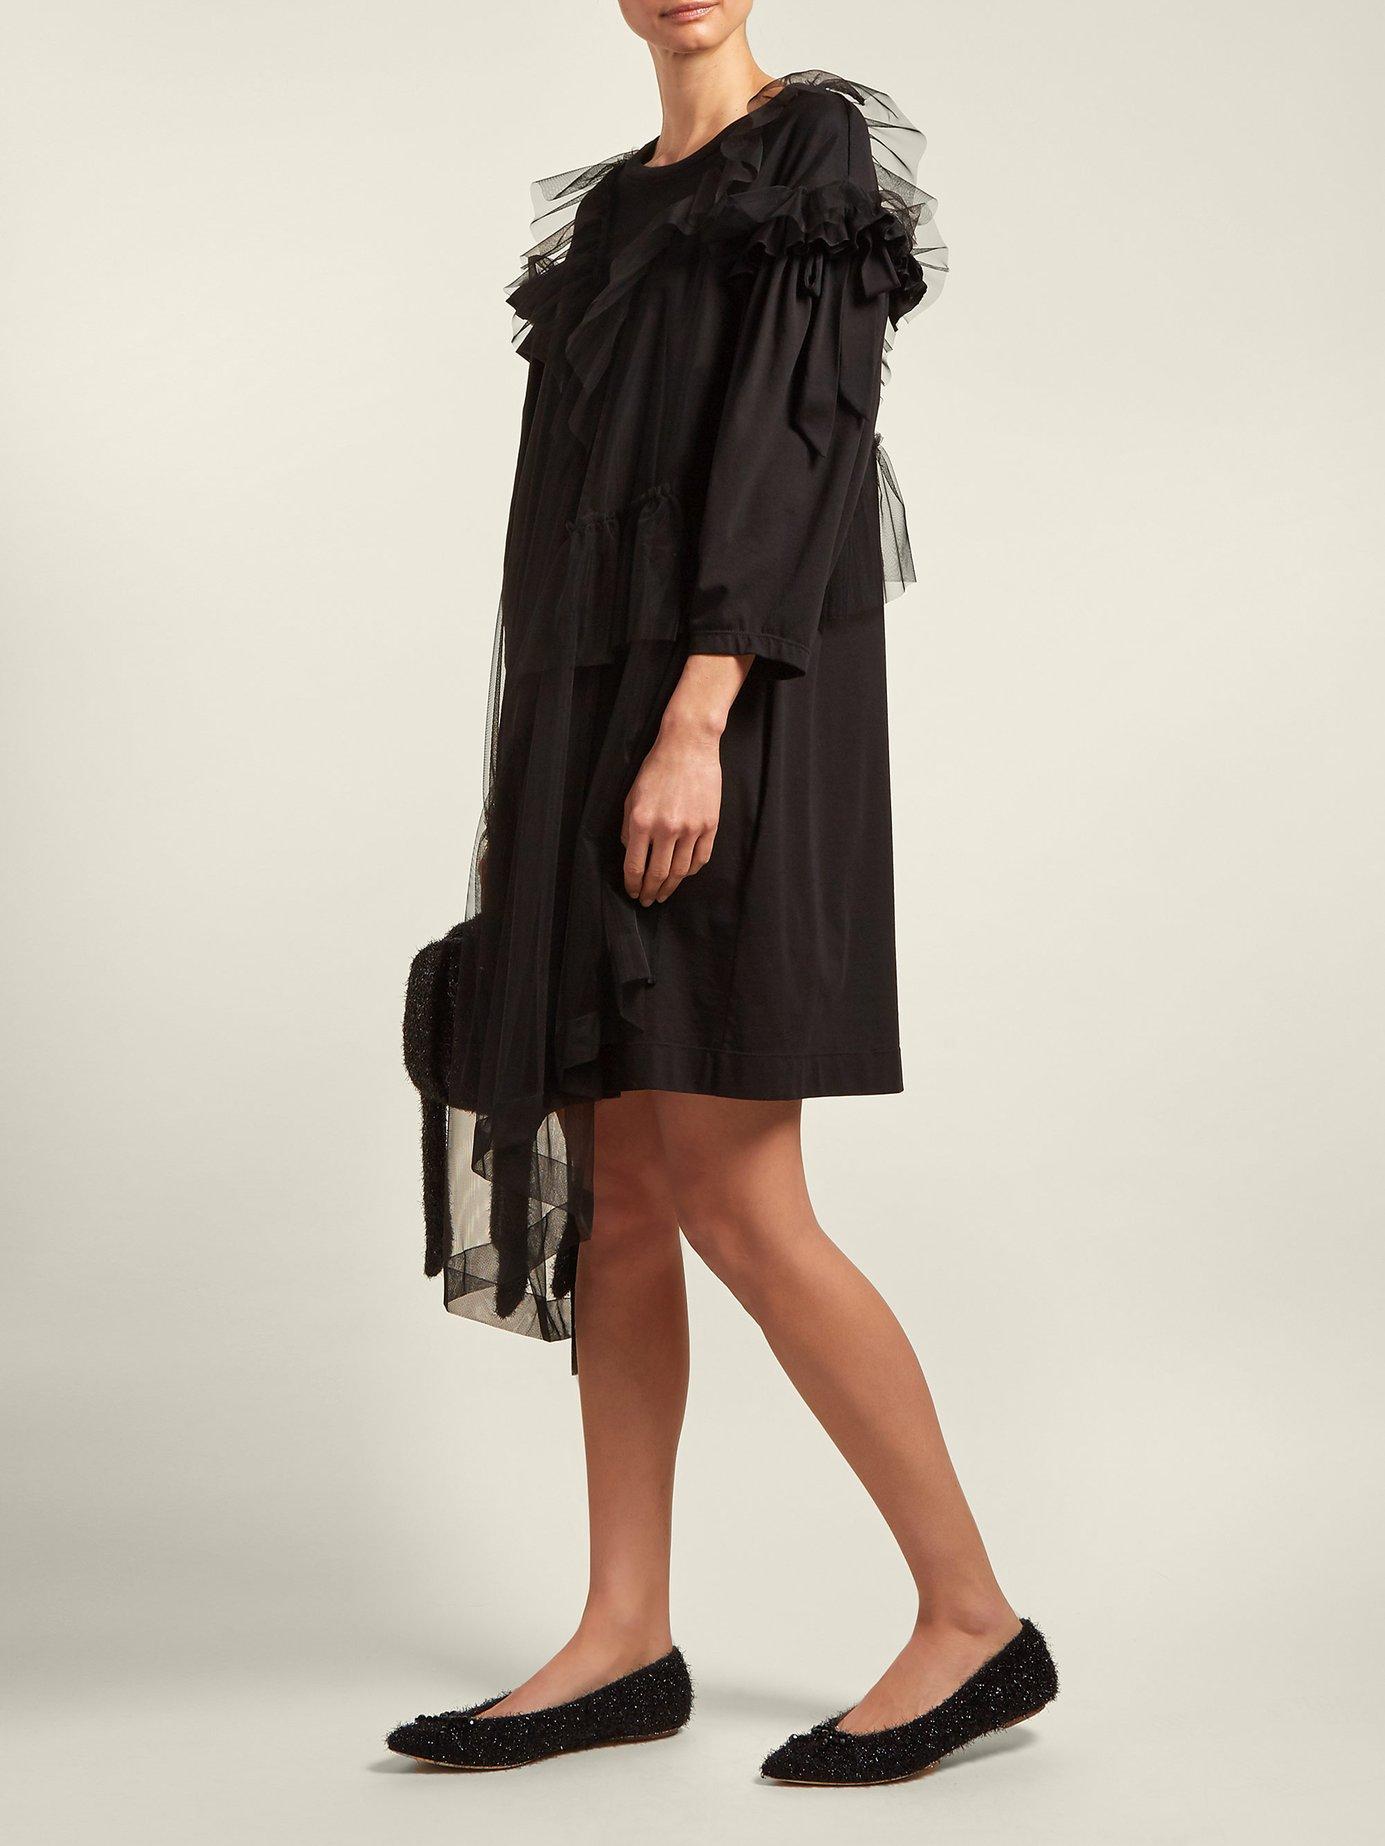 Ruffled tulle-overlay cotton T-shirt dress by Simone Rocha